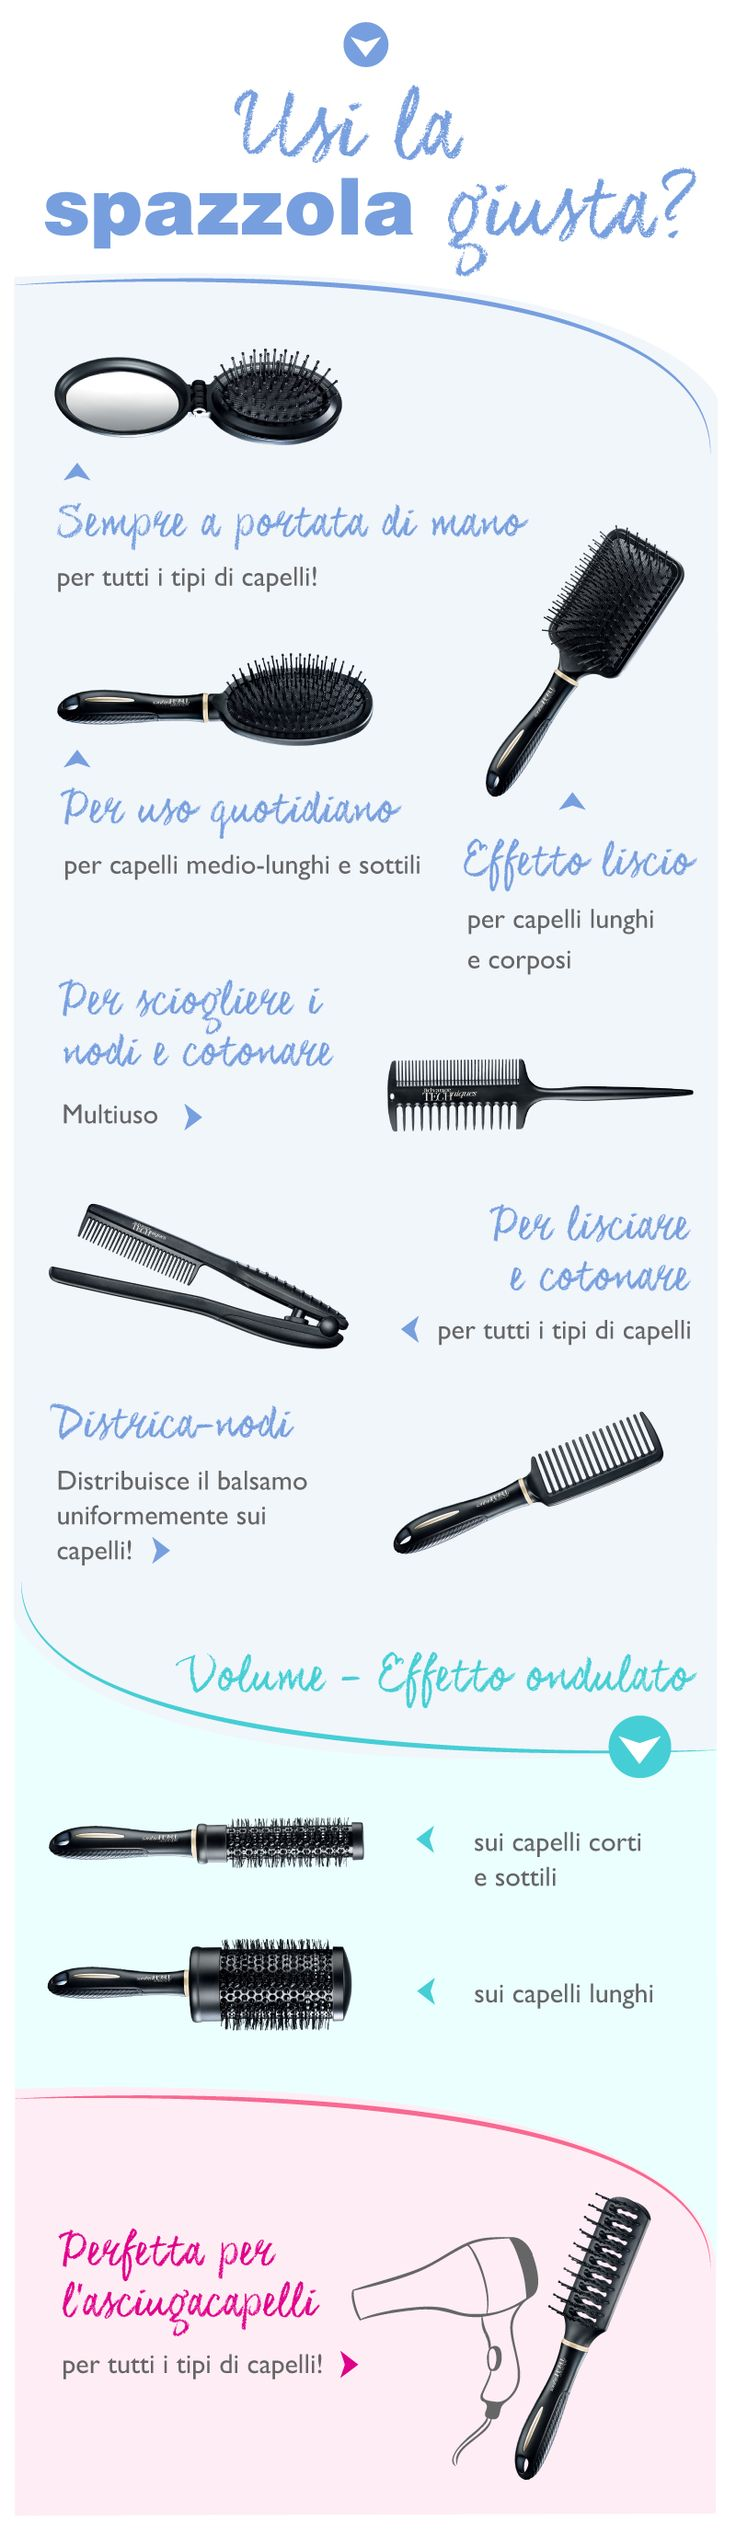 AvonBlog | Usi la spazzola giusta | http://avonblog.it